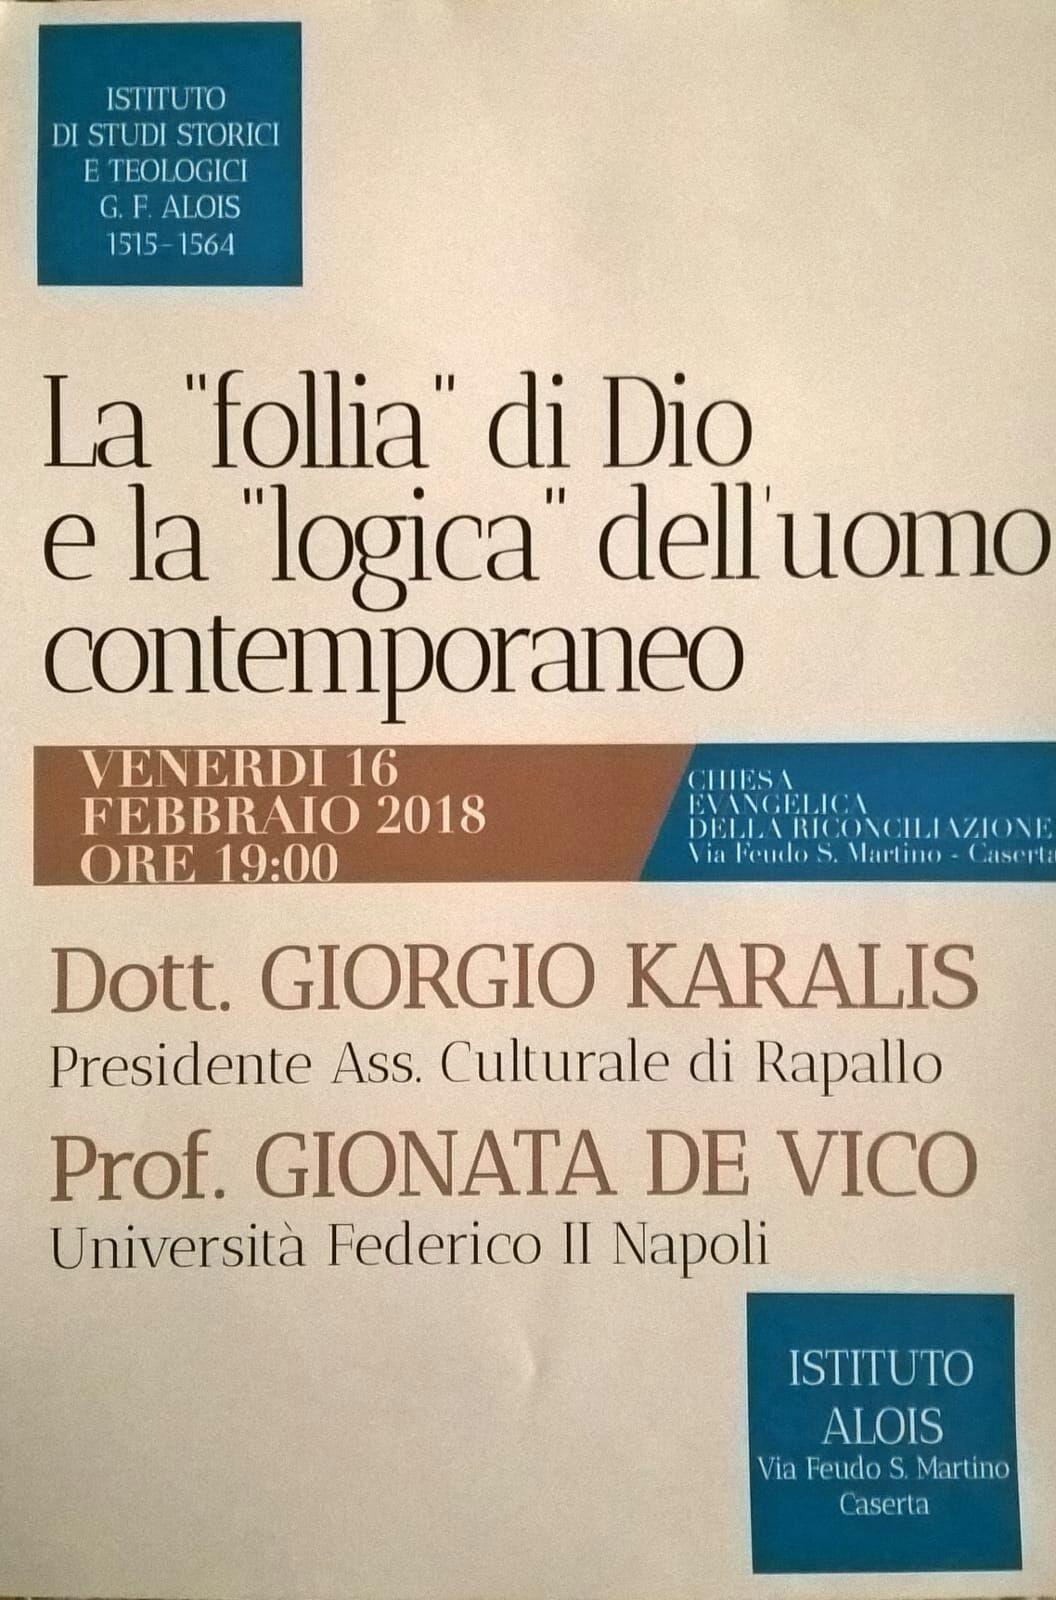 lafolliadidio